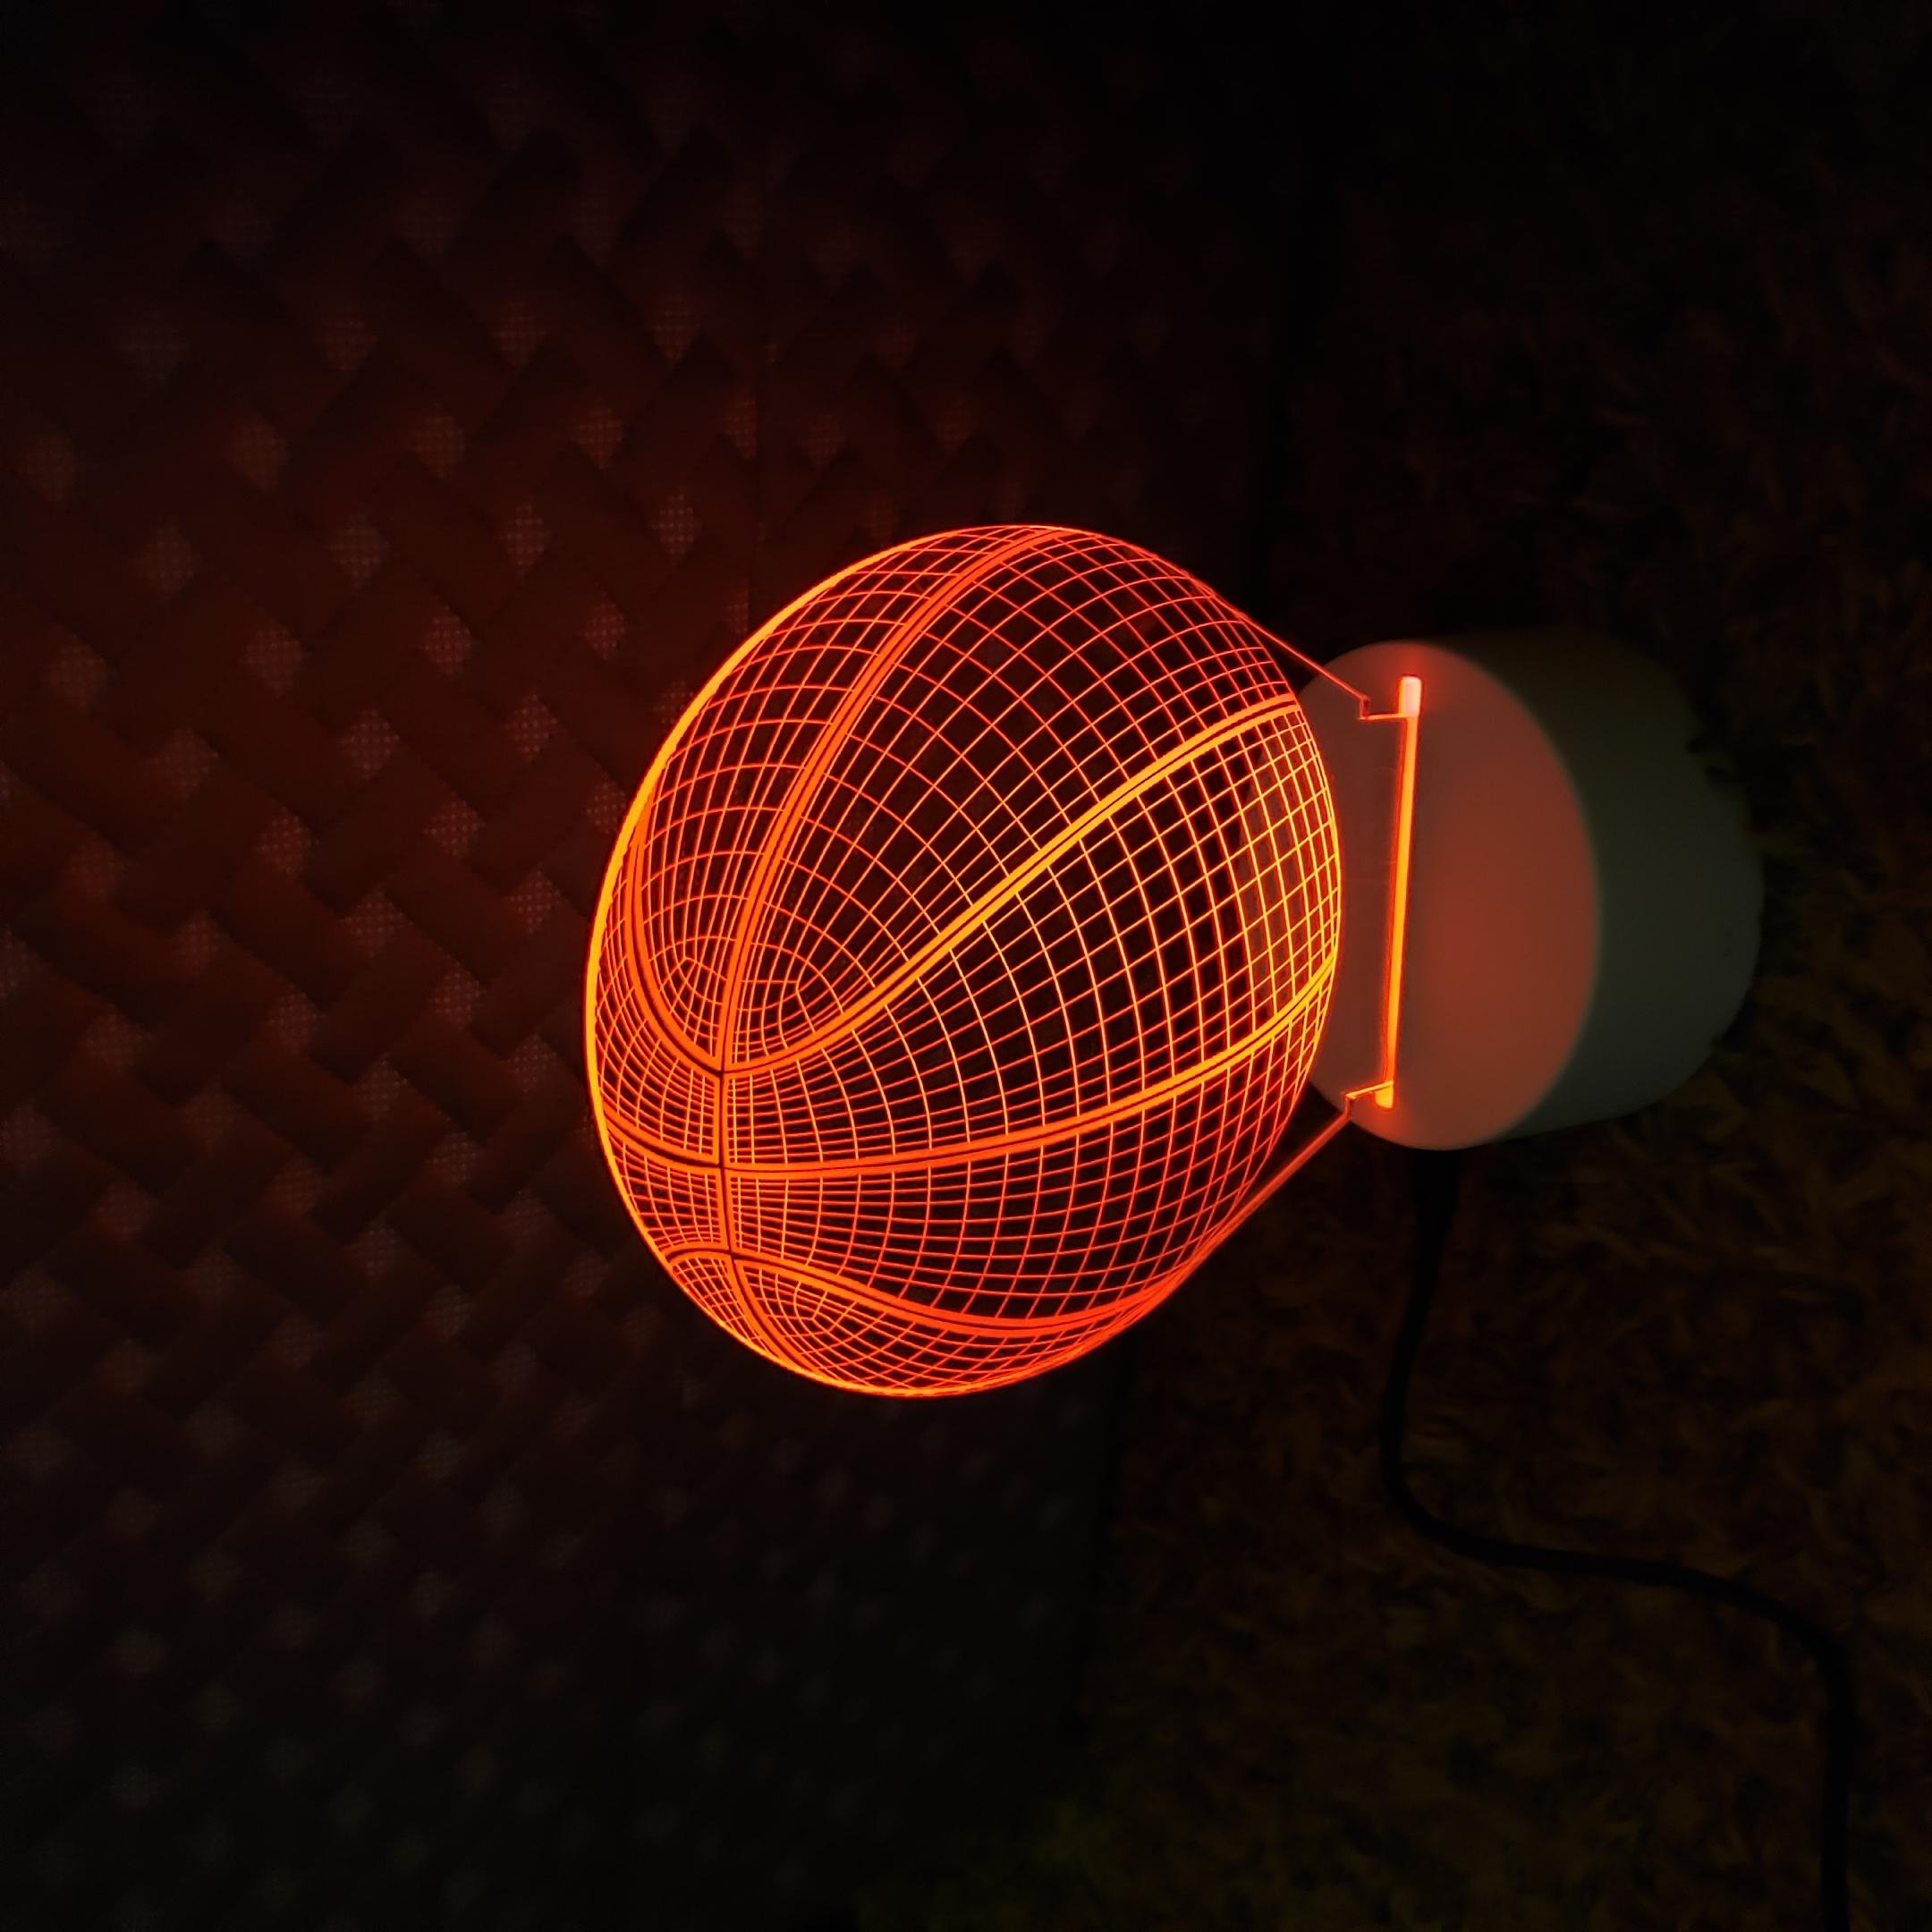 Great  LED Illusion light!